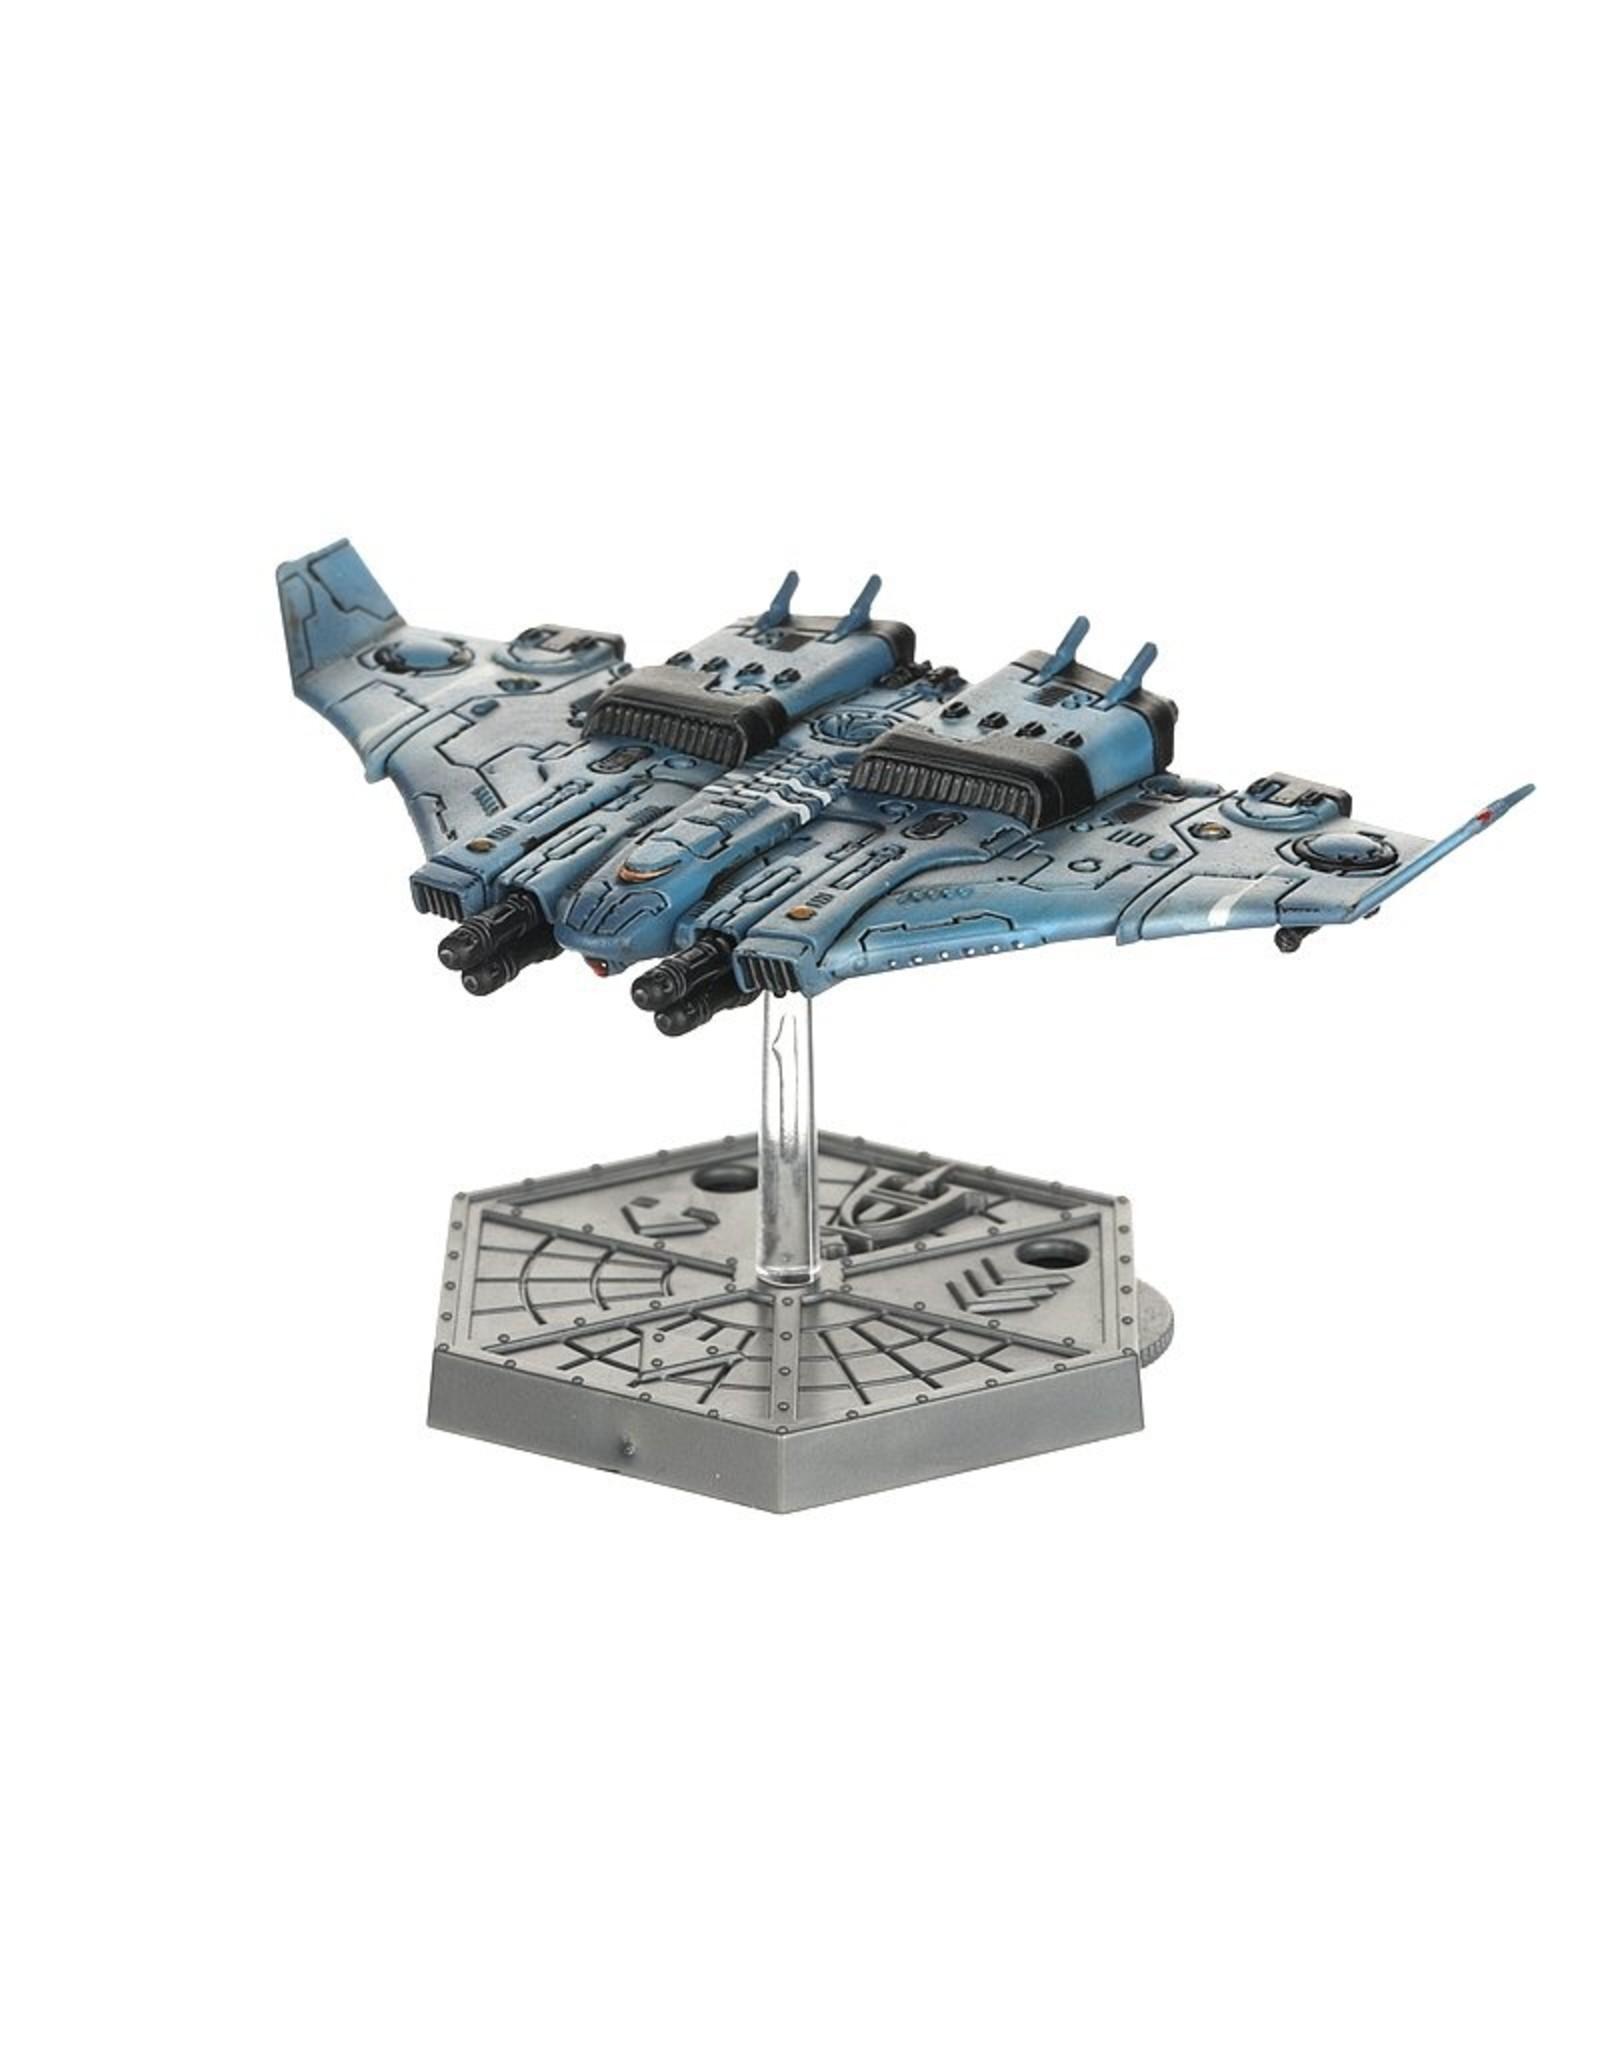 Games Workshop Aero/Imperialis: T'au Tiger Shark AX-1.0 Fighter-Bomb